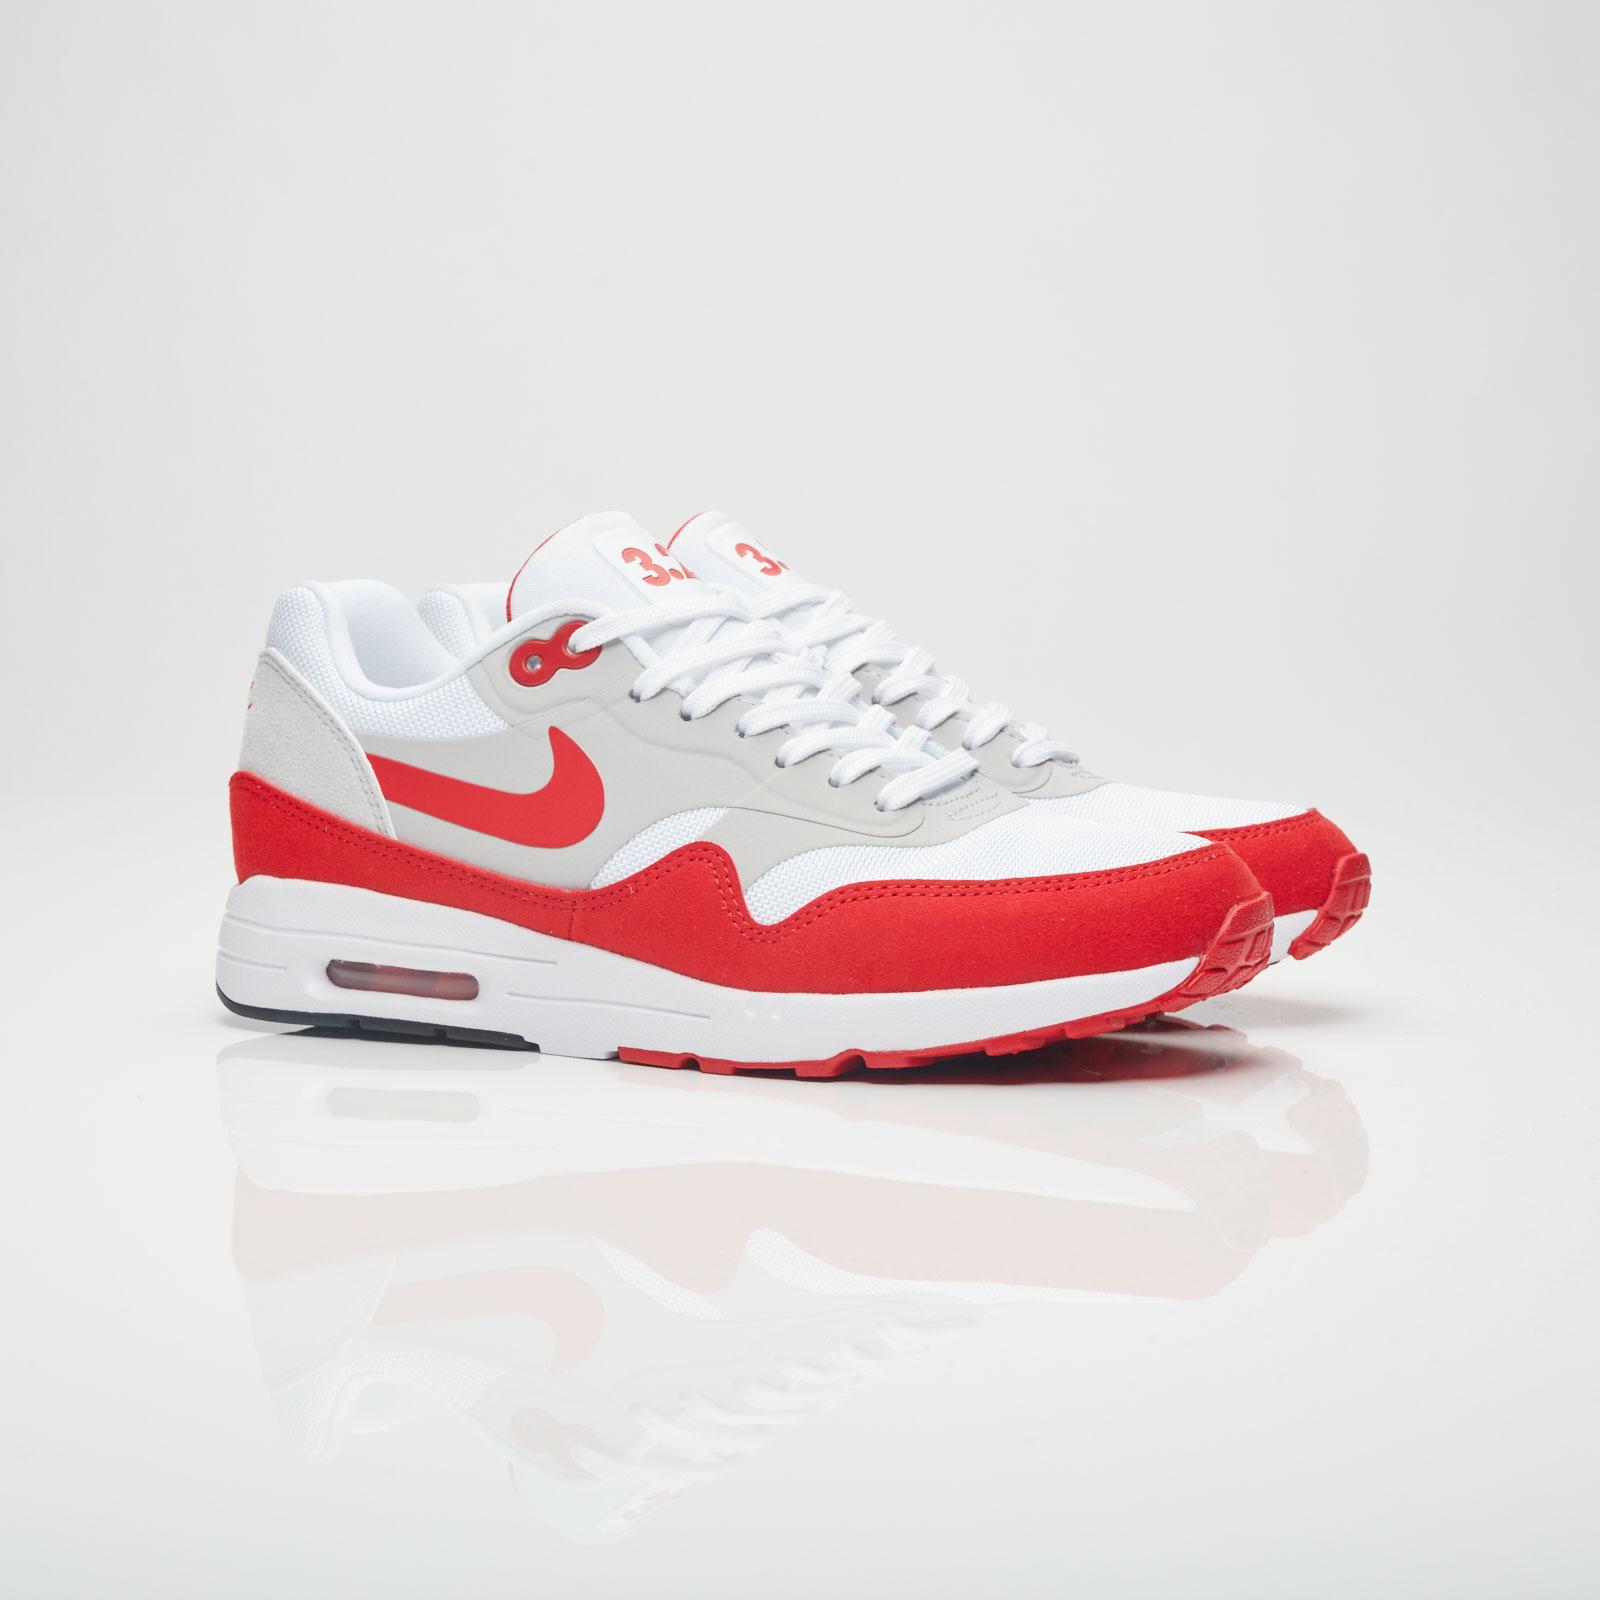 c463e92997 Nike Wmns Air Max 1 Ultra 2.0 Le - 908489-101 - Sneakersnstuff ...